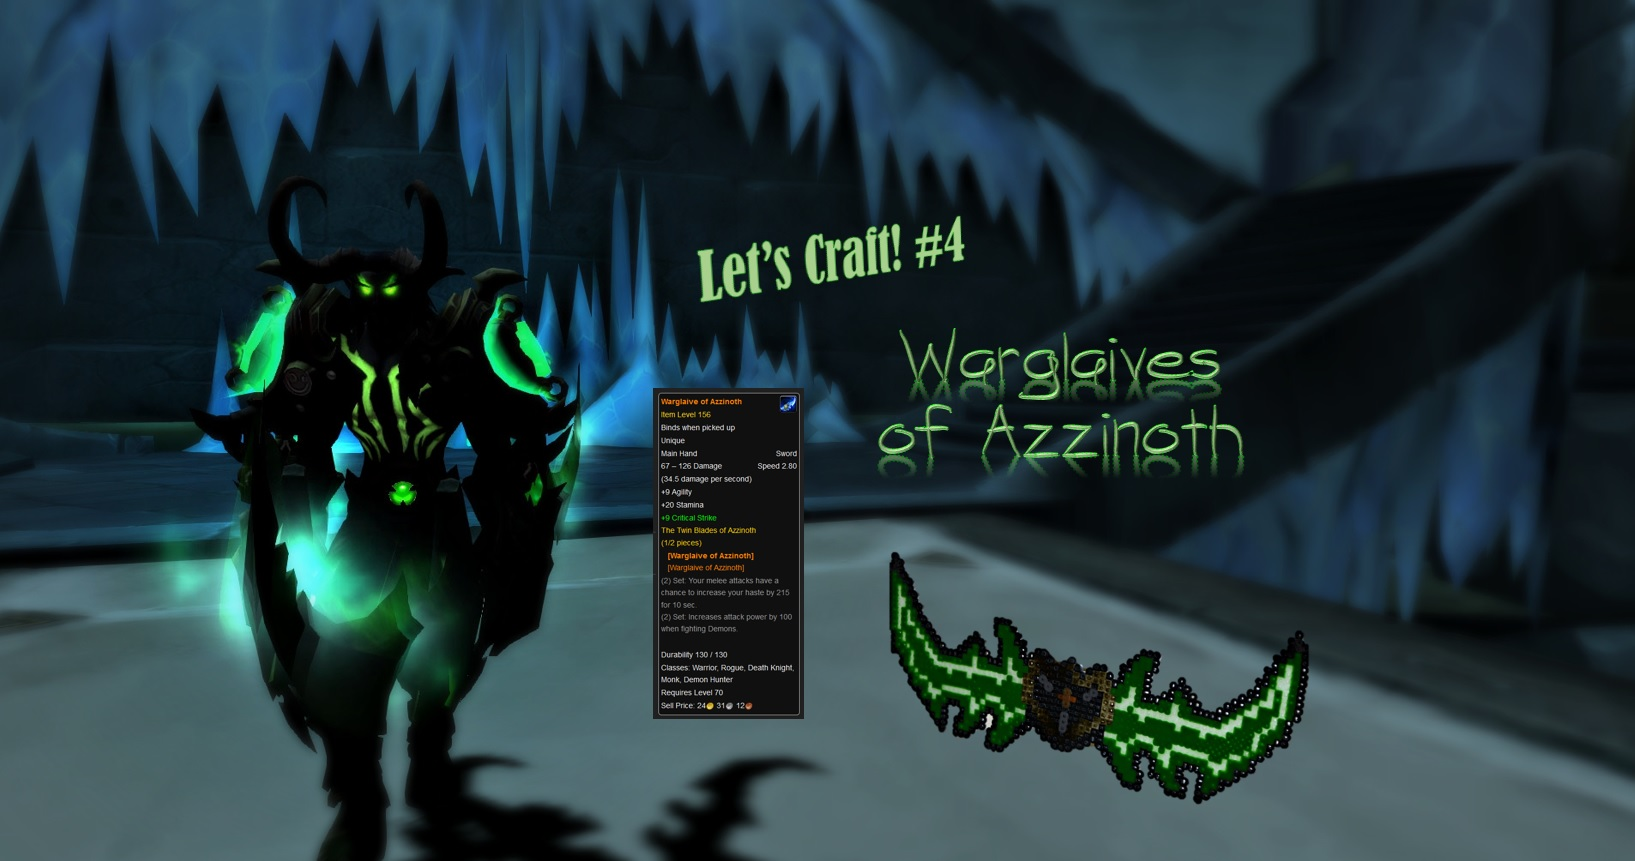 Straightforward Warcraft Warglave Of Azzinoth Tv, Film & Game Replica Blades